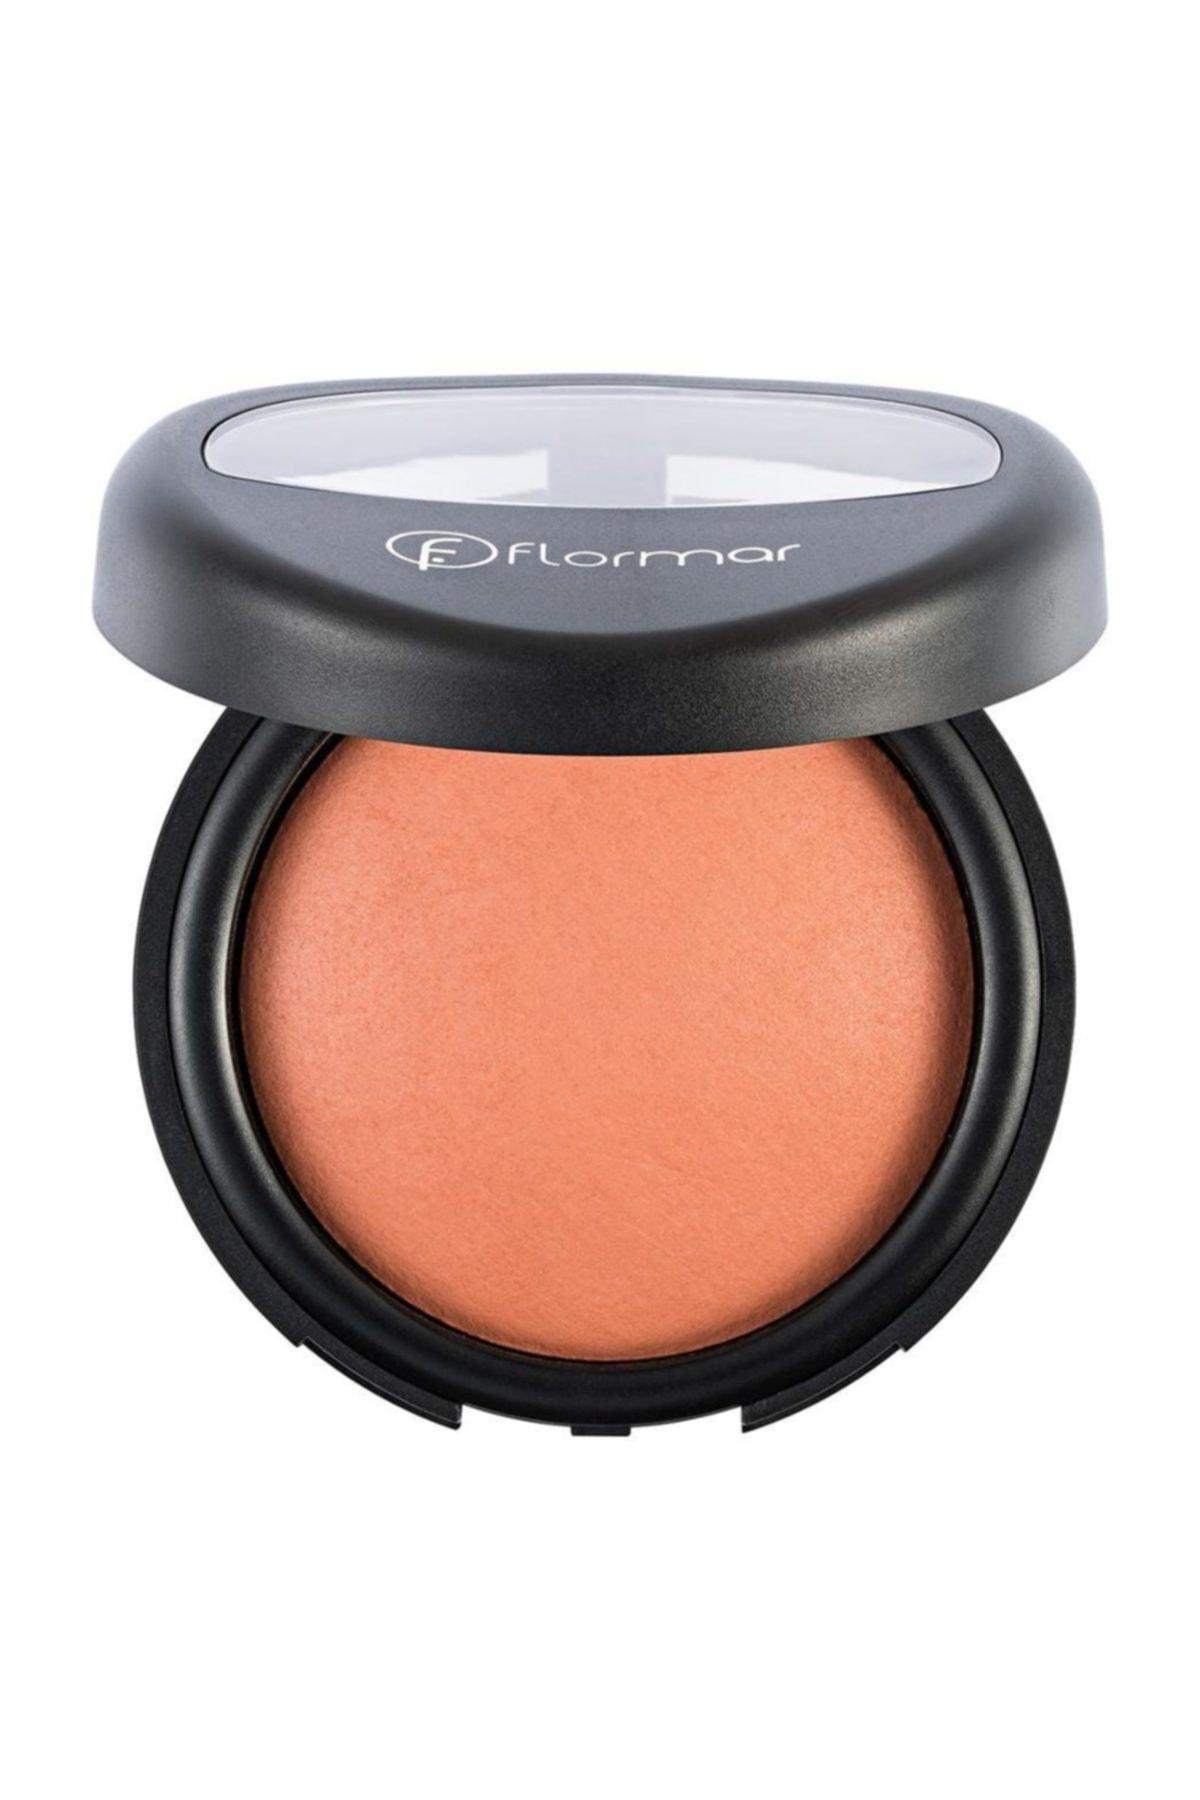 Flormar Allık - Baked Blush-On Pure Peach 9 g 8690604178988 1